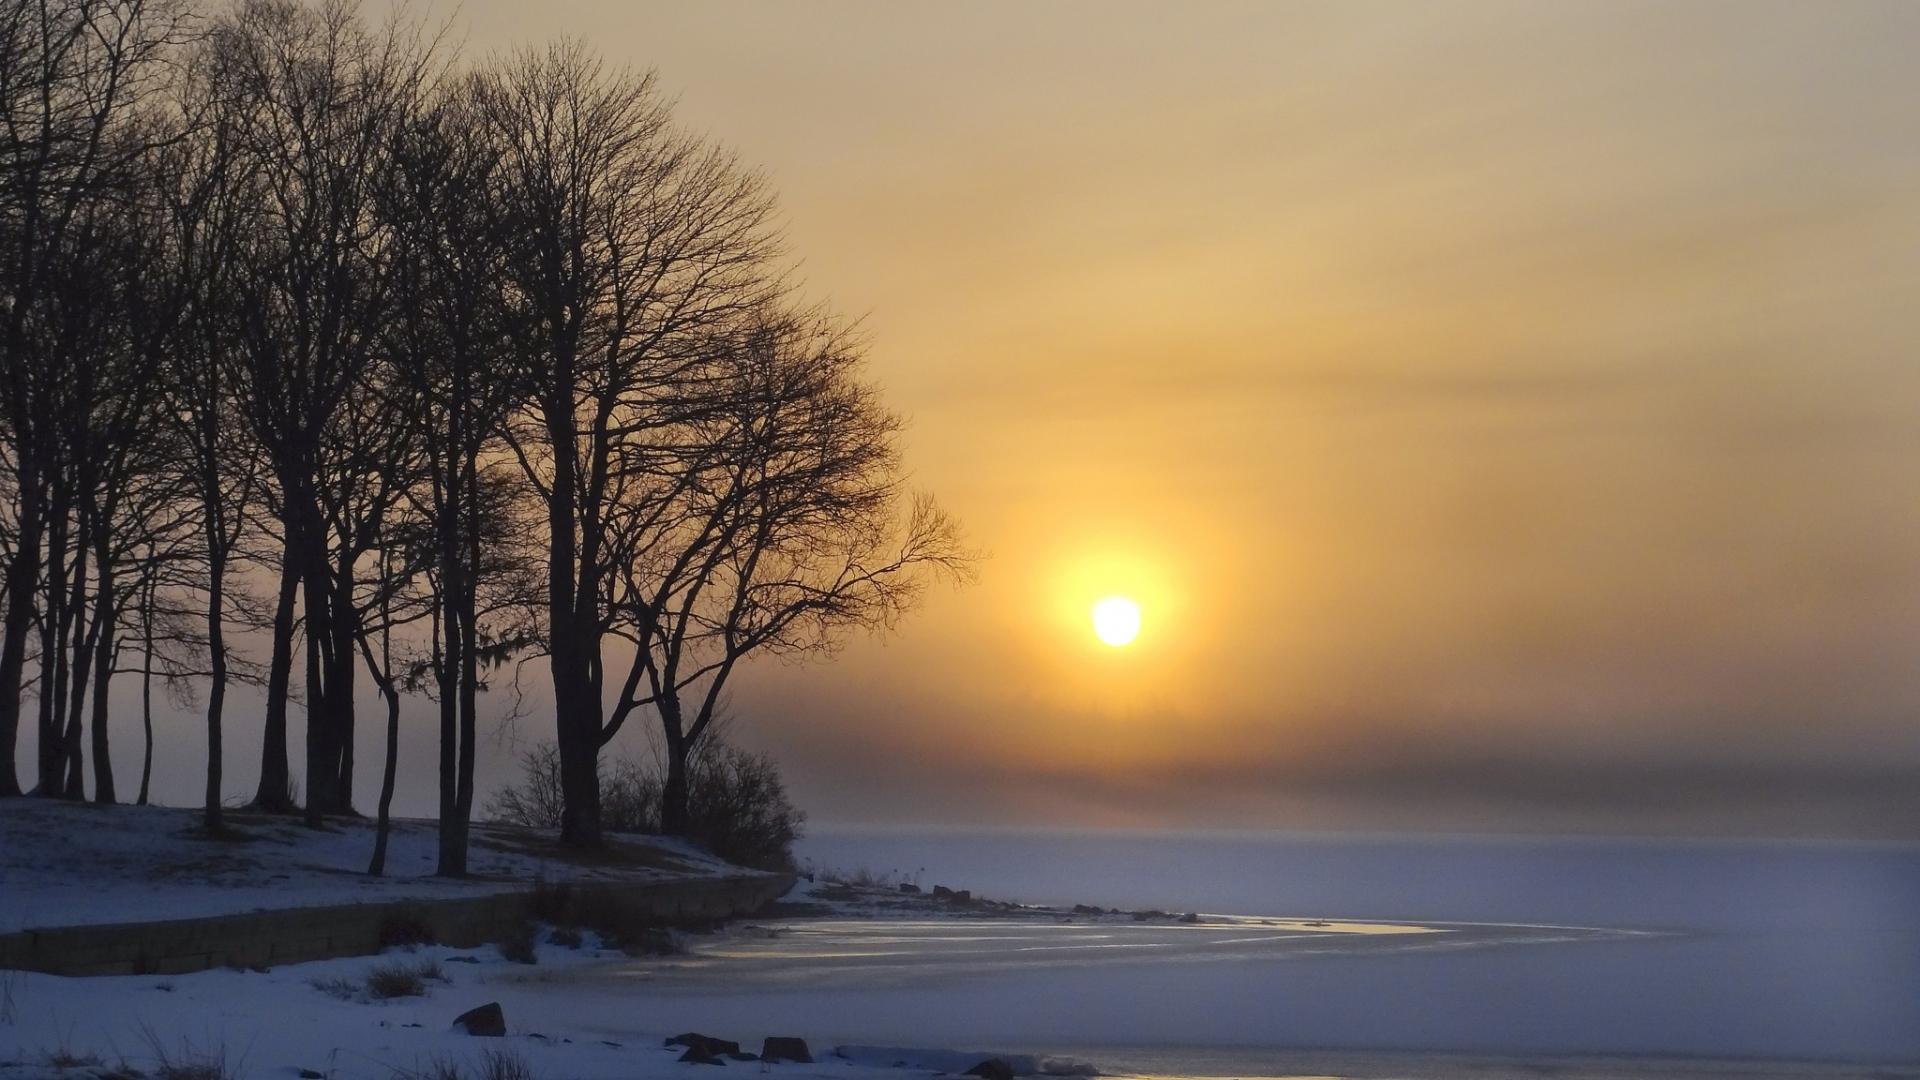 Winter Dawn Wallpaper For Desktop